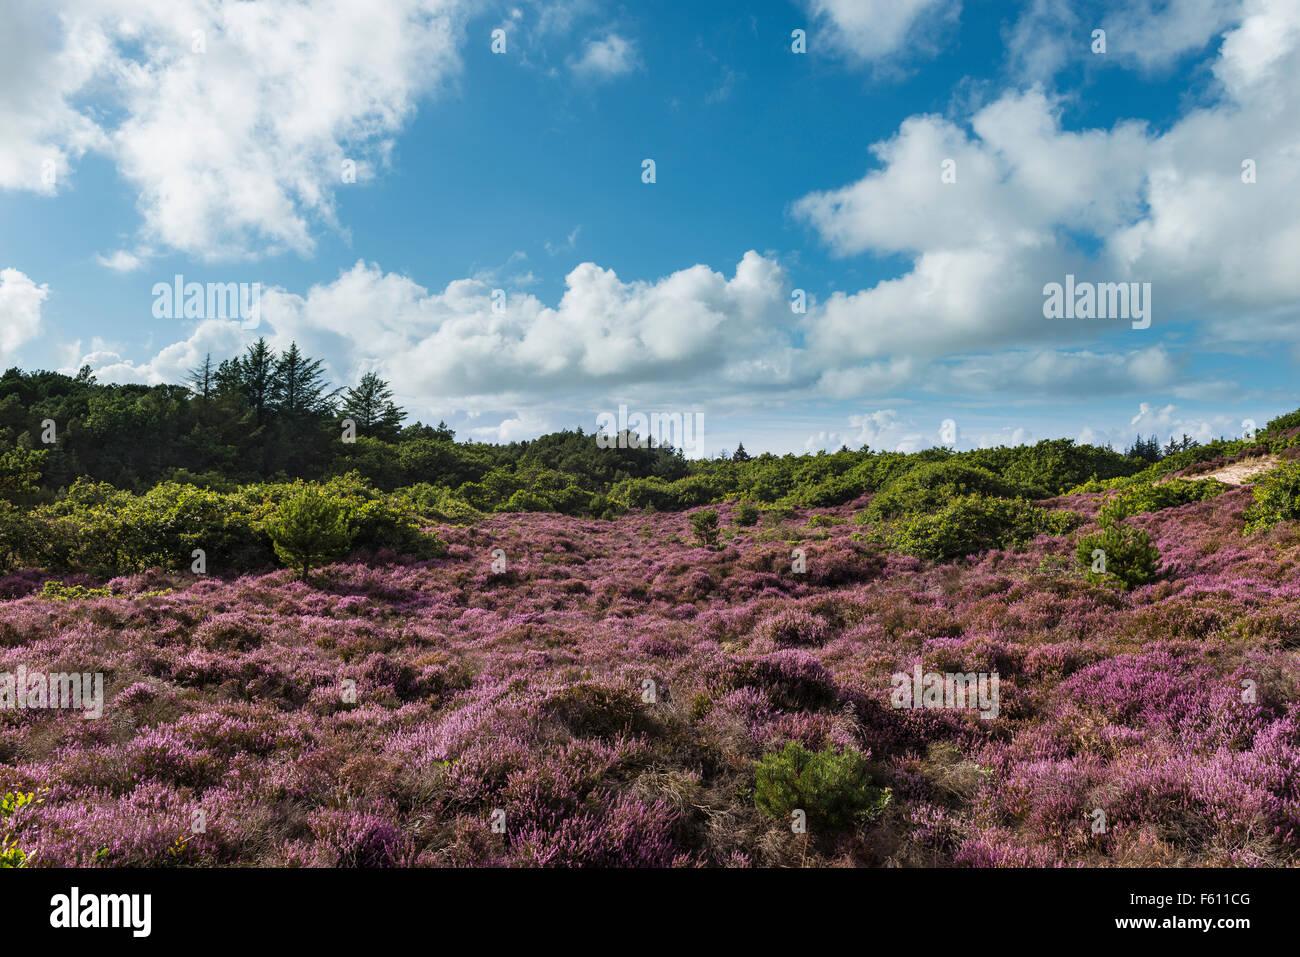 Heathland with flowering heather (Calluna vulgaris), Oksböl, Region of Southern Denmark, Denmark Stock Photo